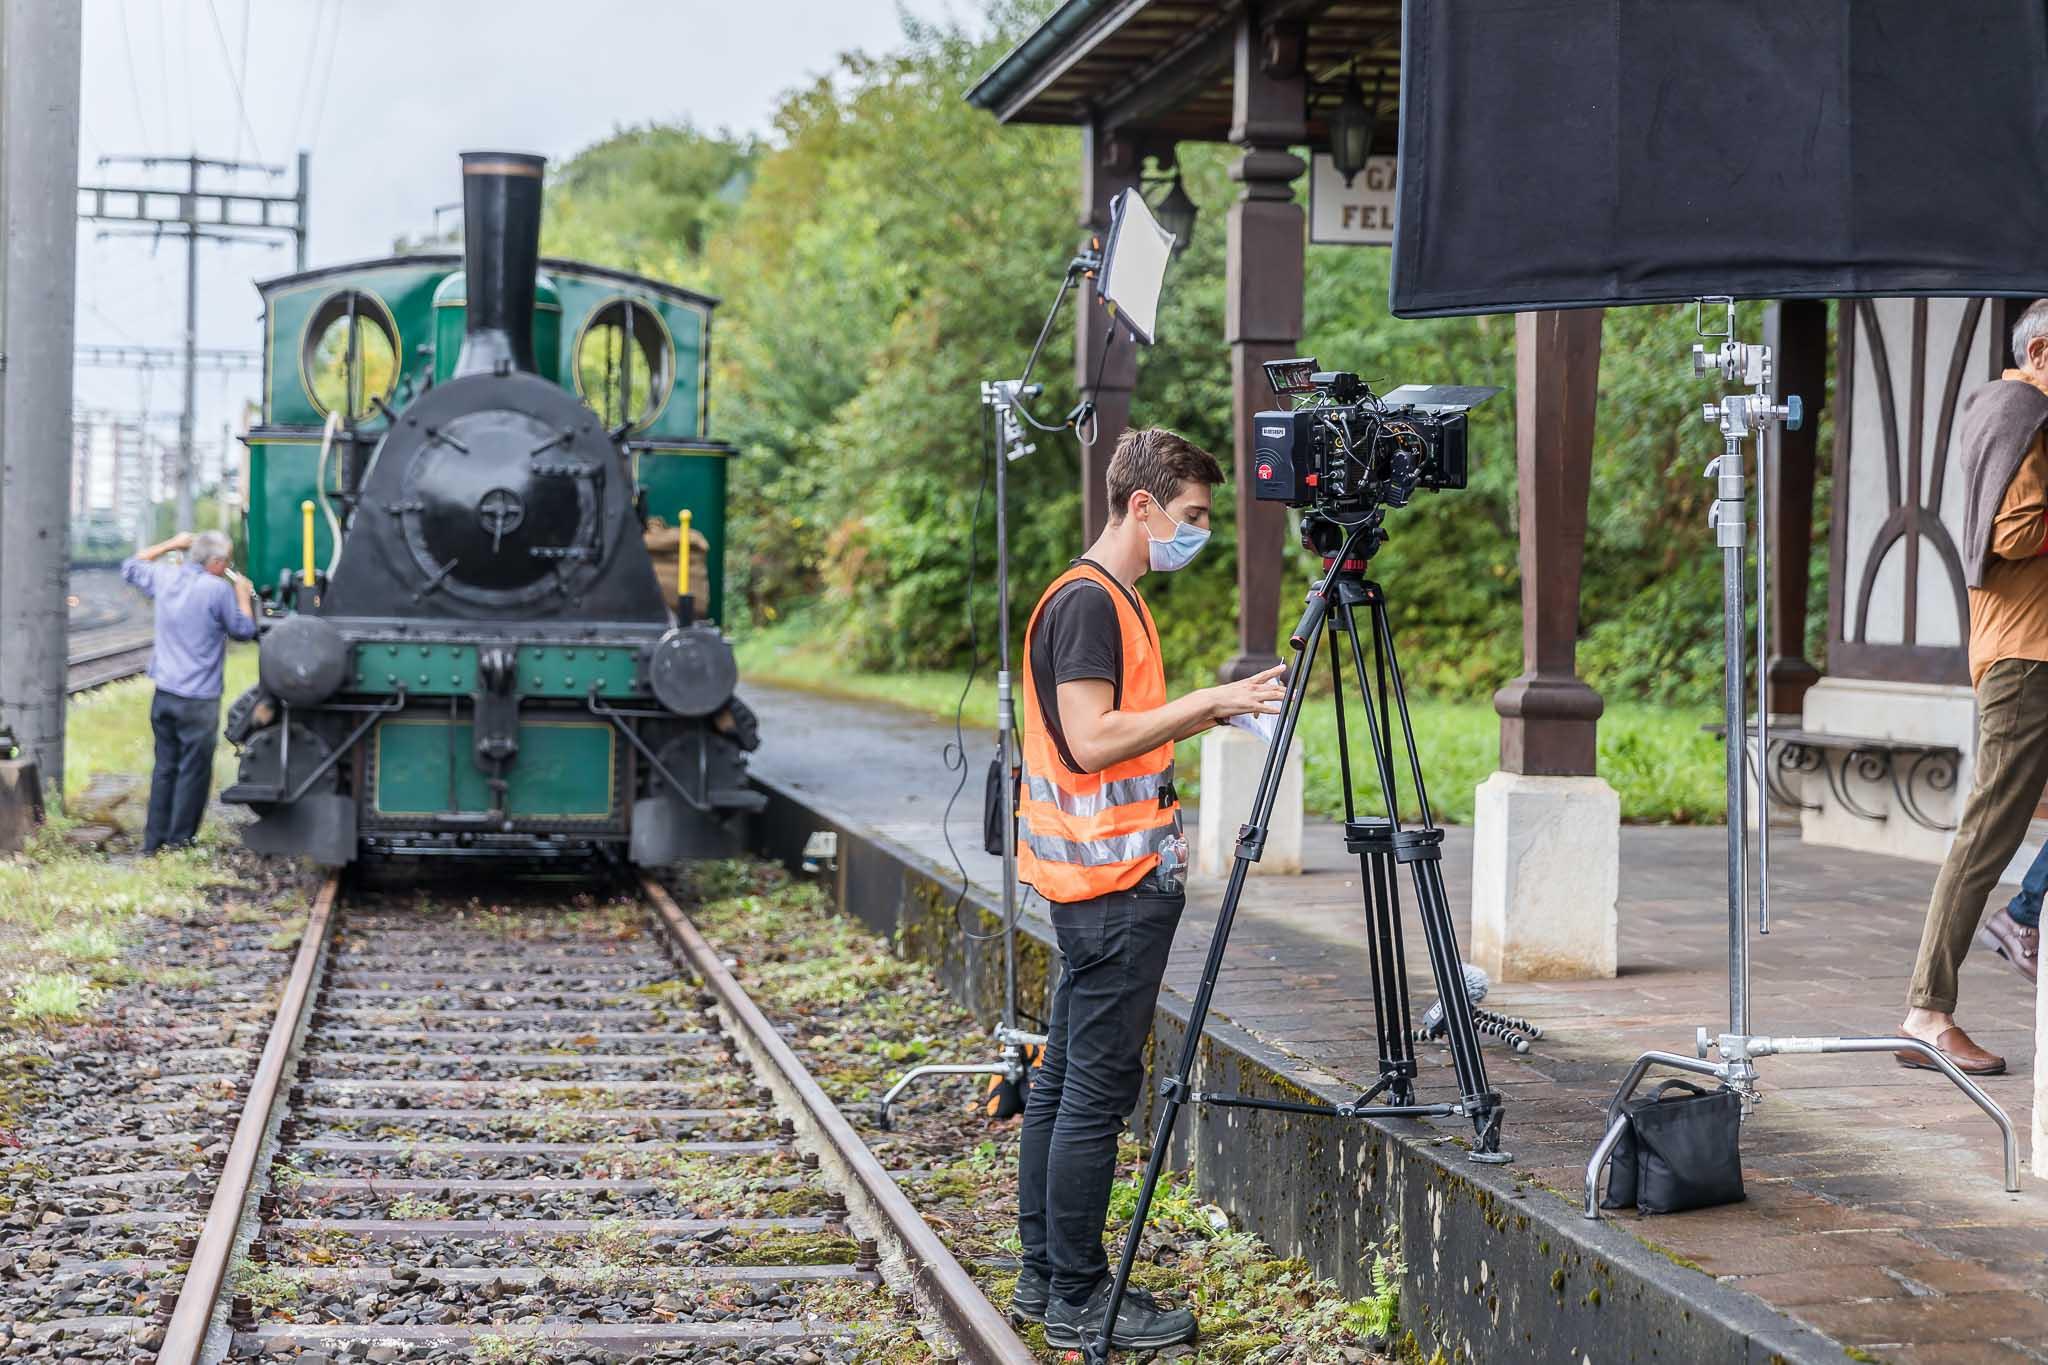 Sebastian Klinger behind camera on railway tracks